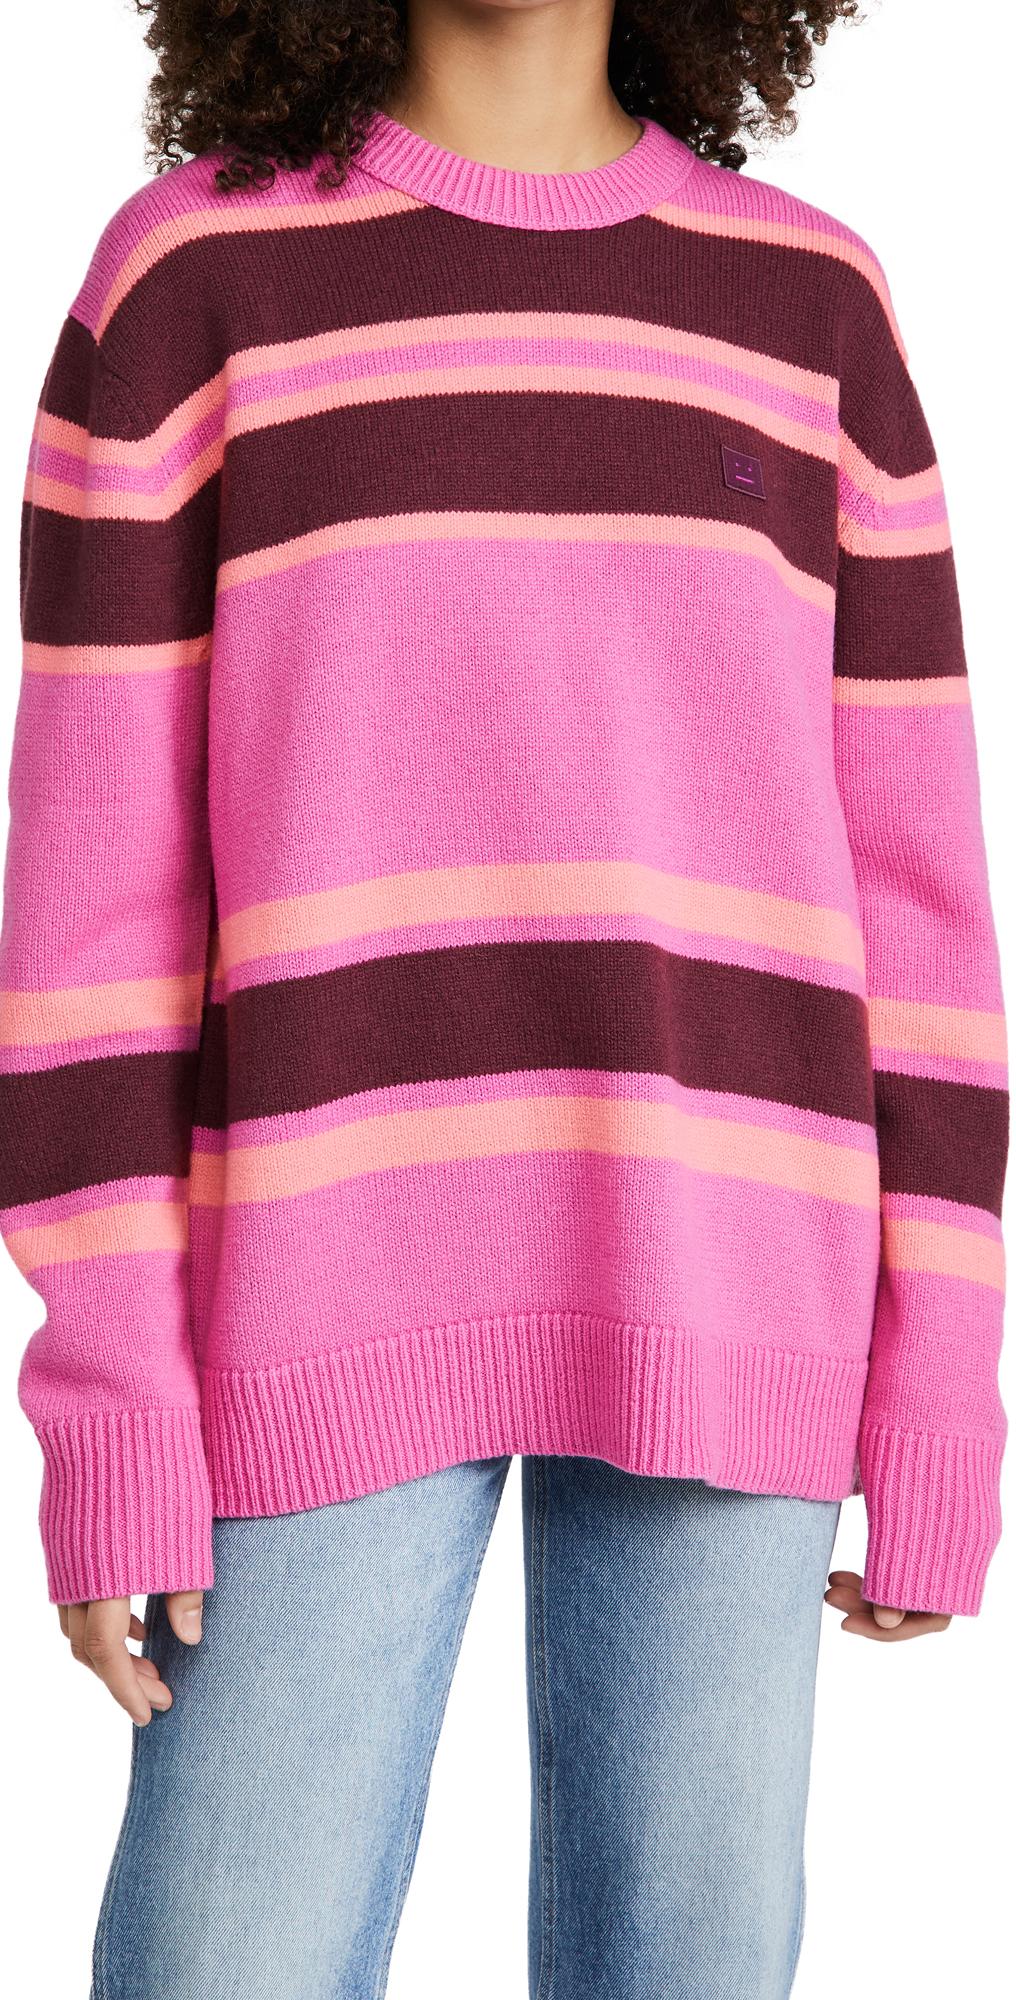 Acne Studios Nimah Block Striped Sweater